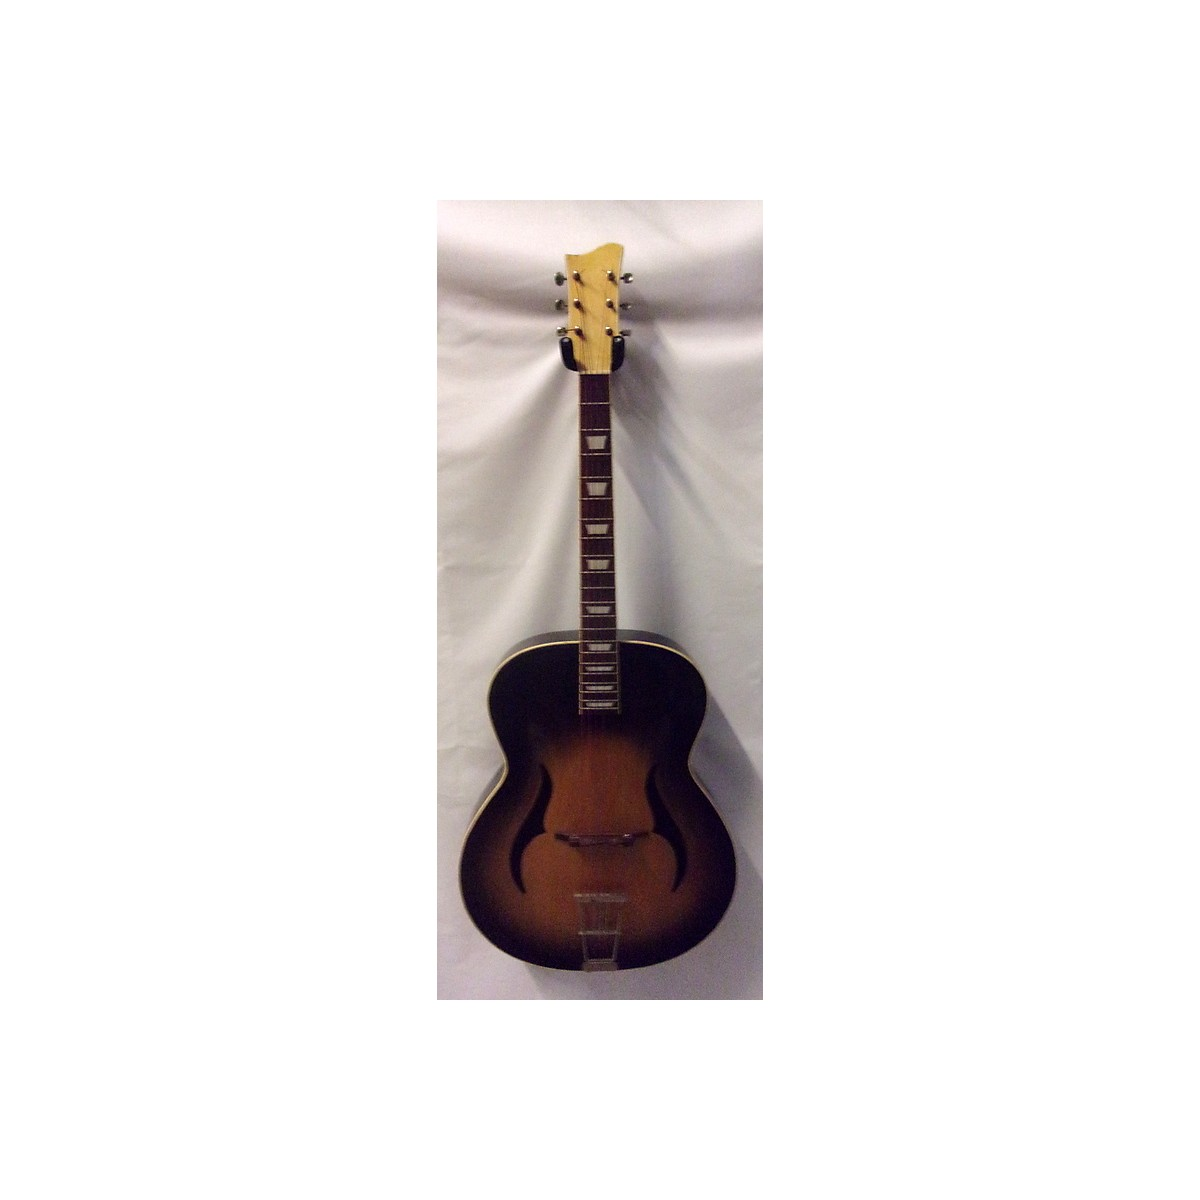 Klira 1970s Semi Hollow Body Acoustic Guitar